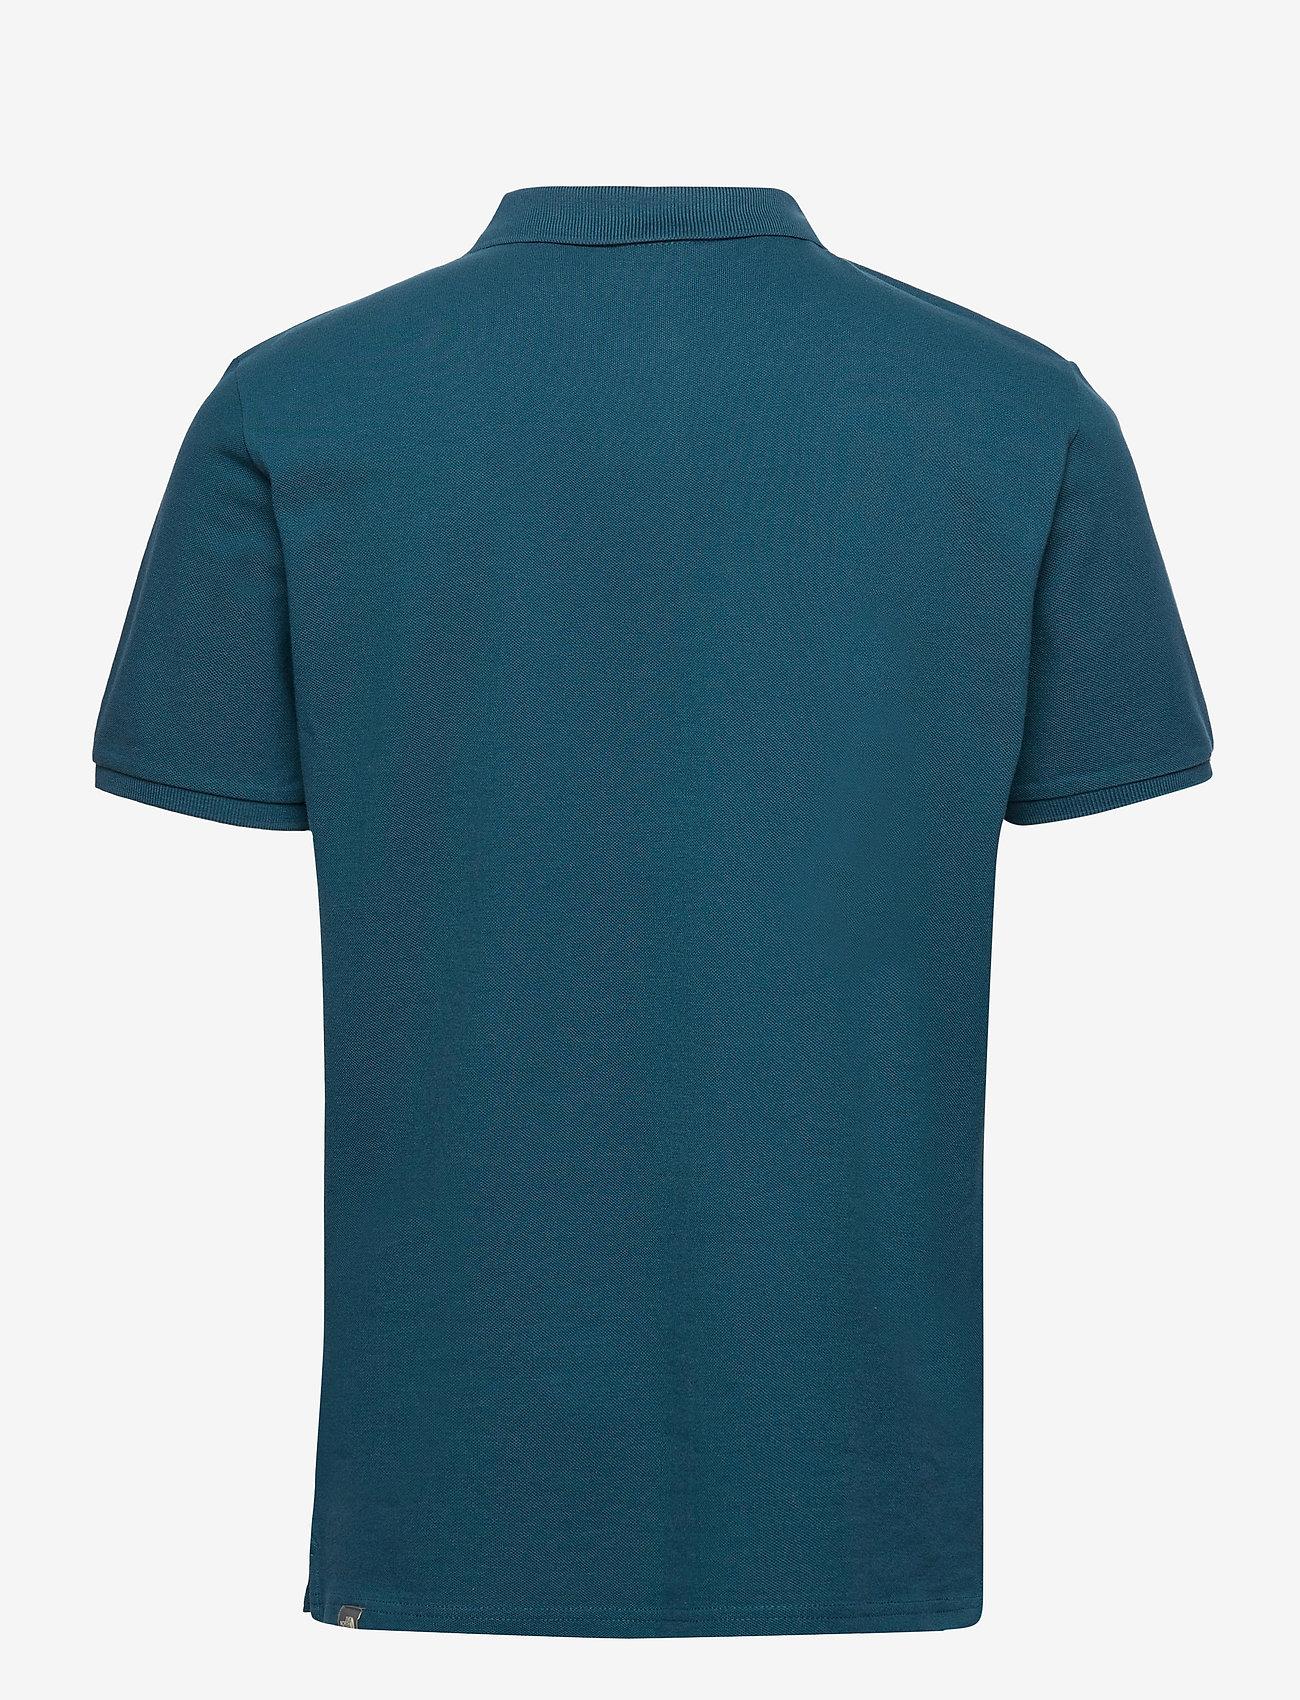 The North Face - M POLO PIQUET - polos à manches courtes - monterey blue - 1